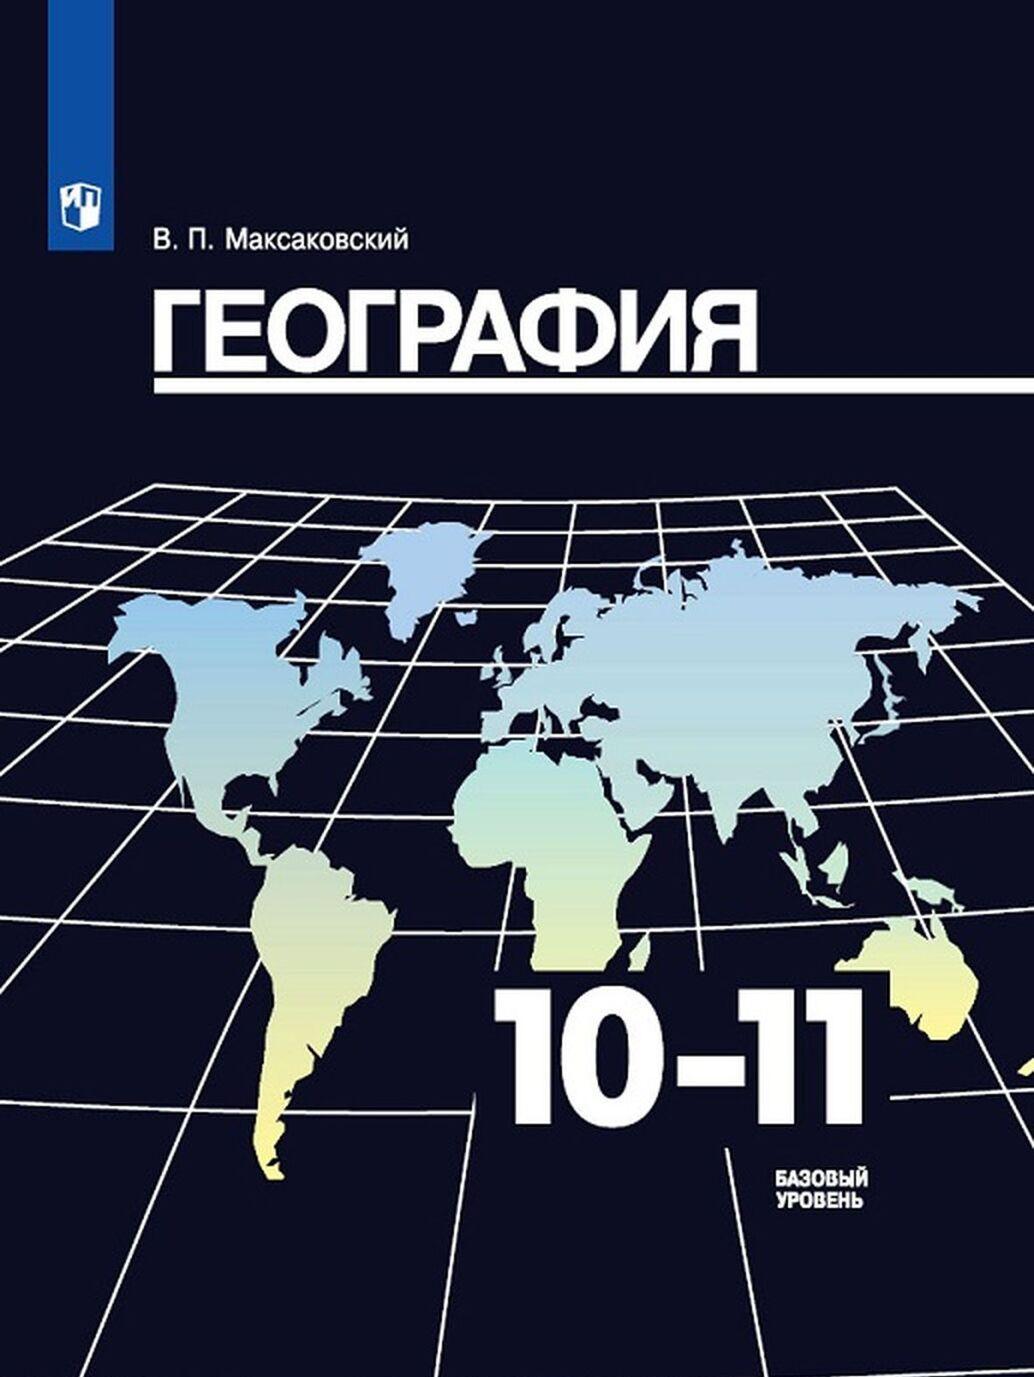 Geografija. 10-11 klassy. Bazovyj uroven